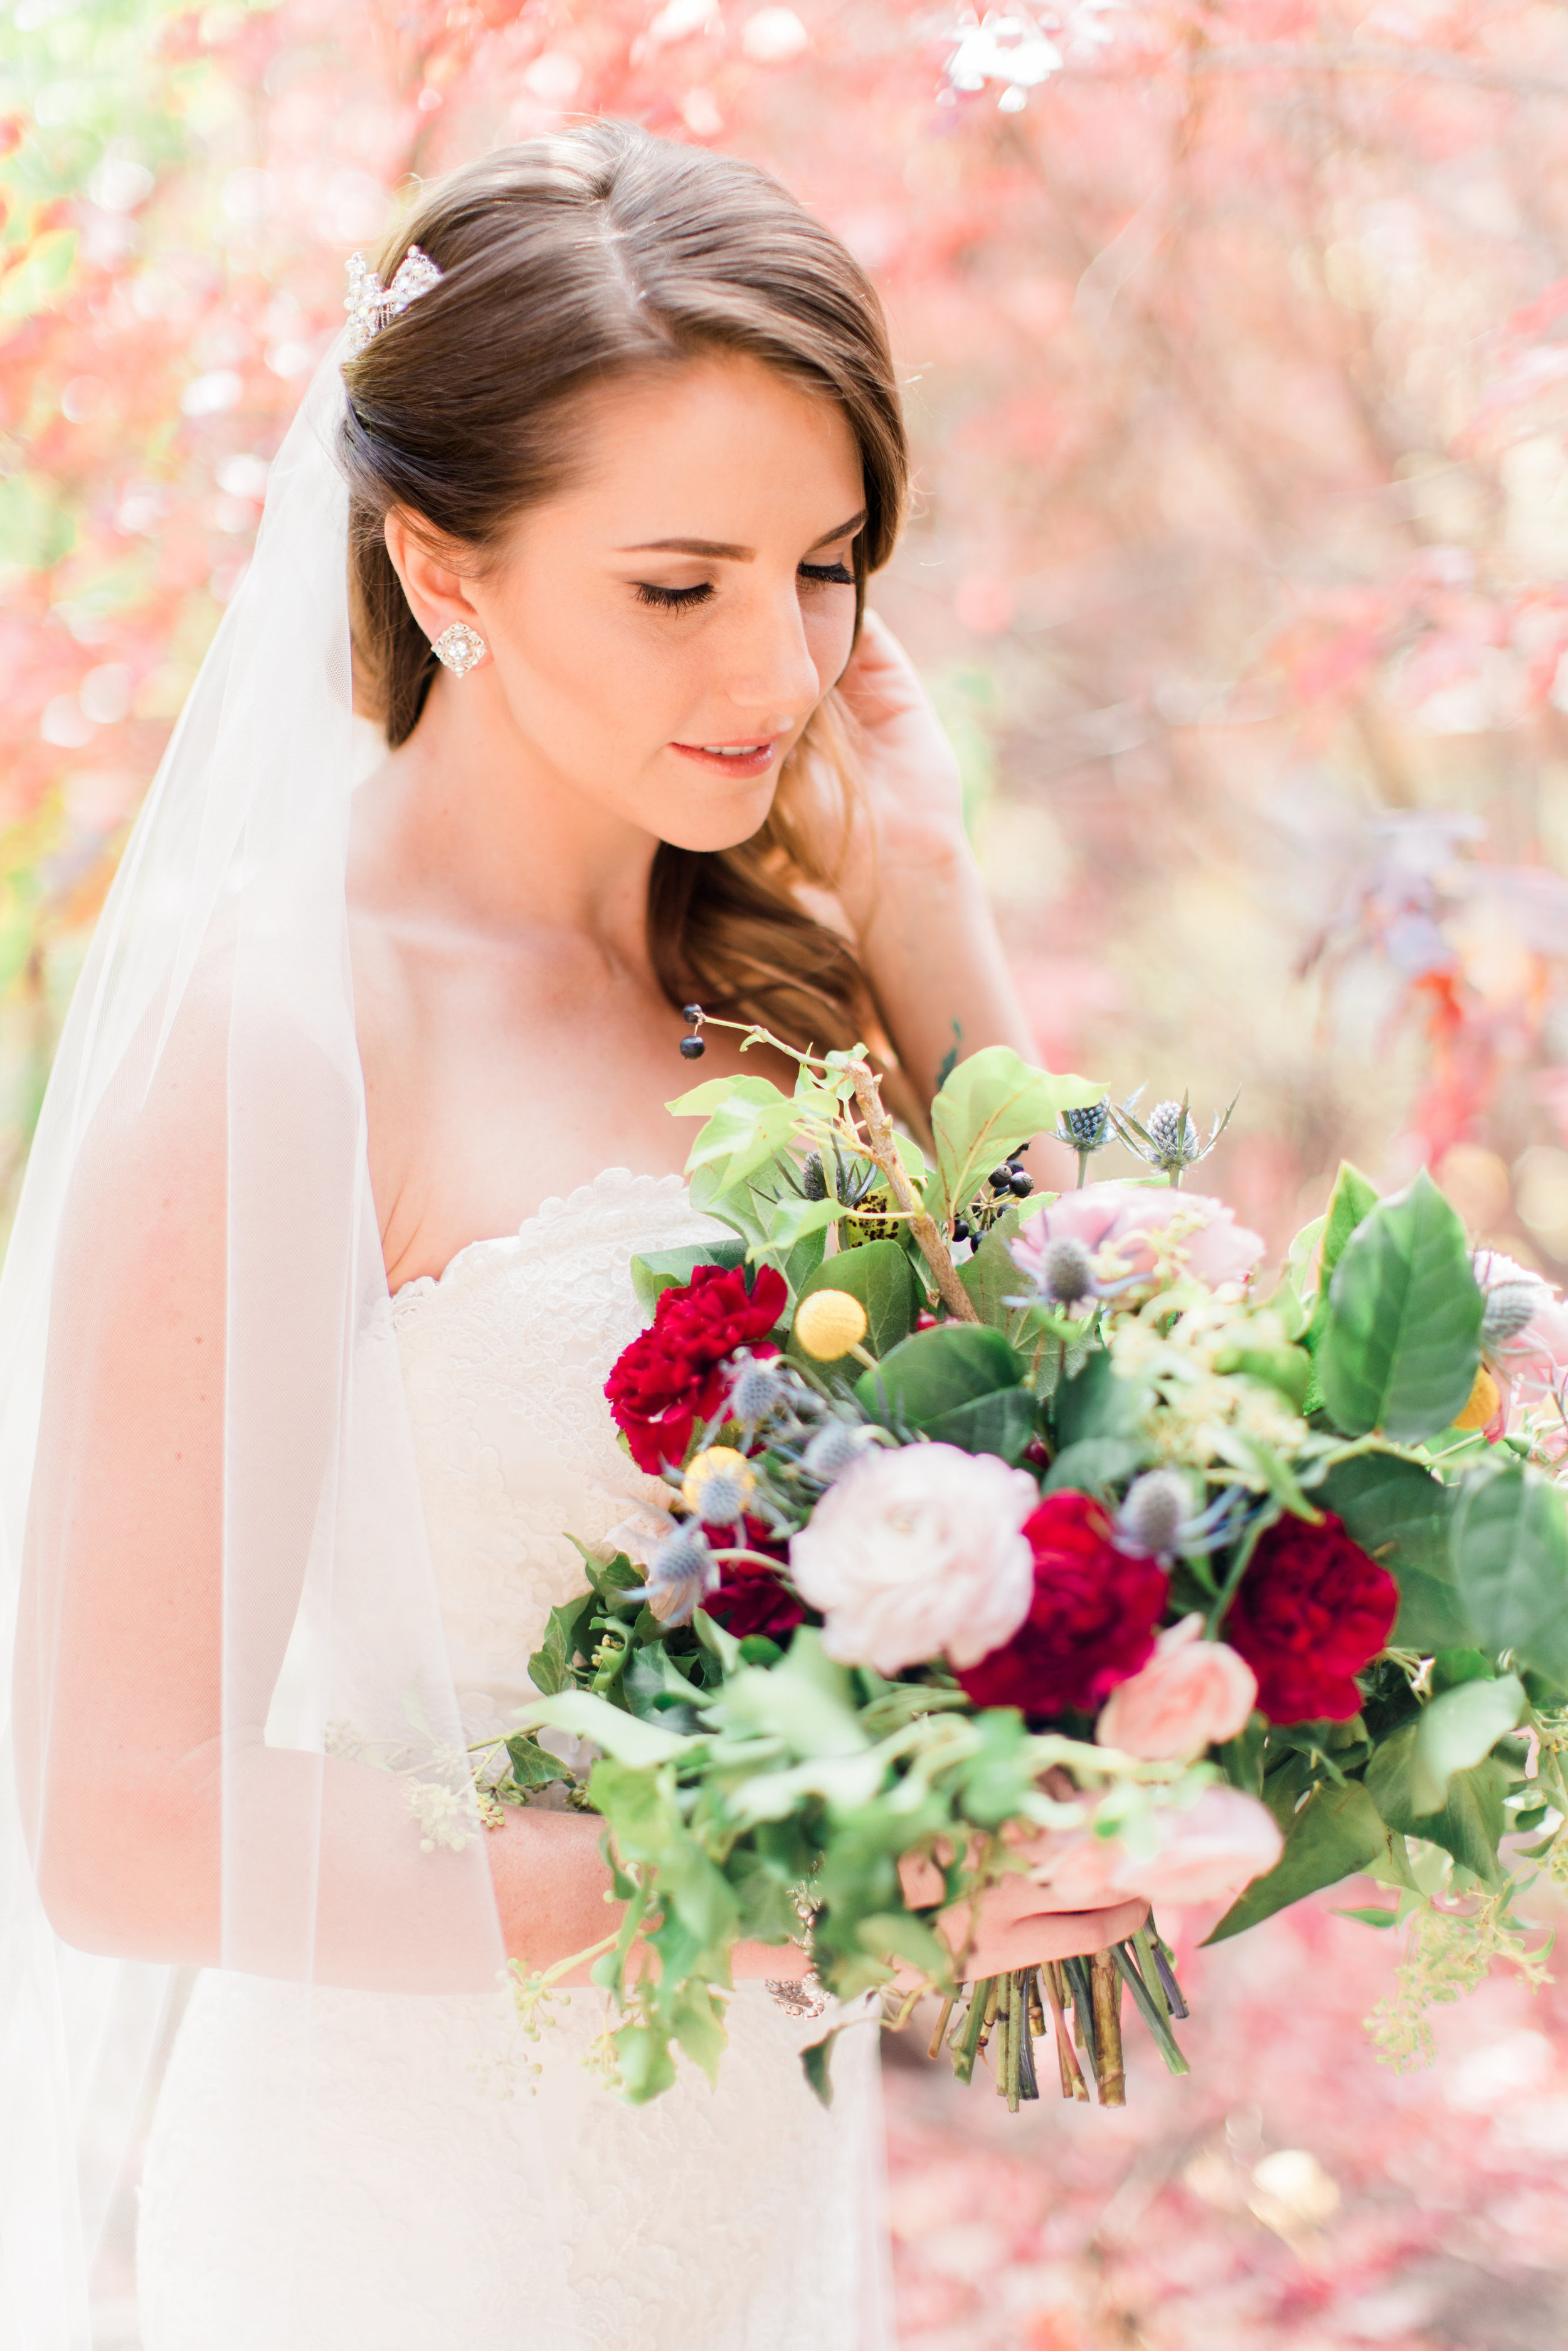 Flagstaff Forest Wedding - Bride and Bouquet